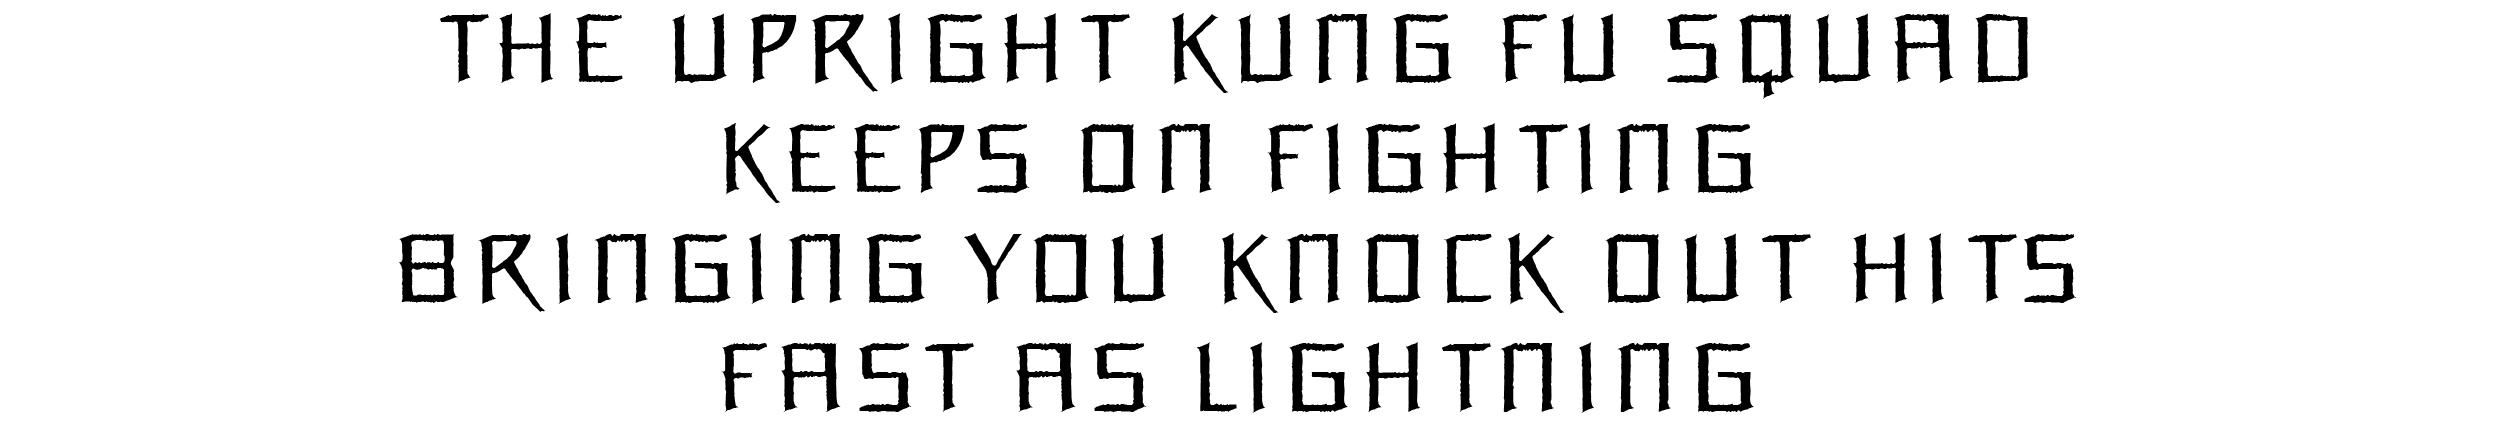 UprightMusic-onlineXmas-Christmas2017-KungFu_.jpg